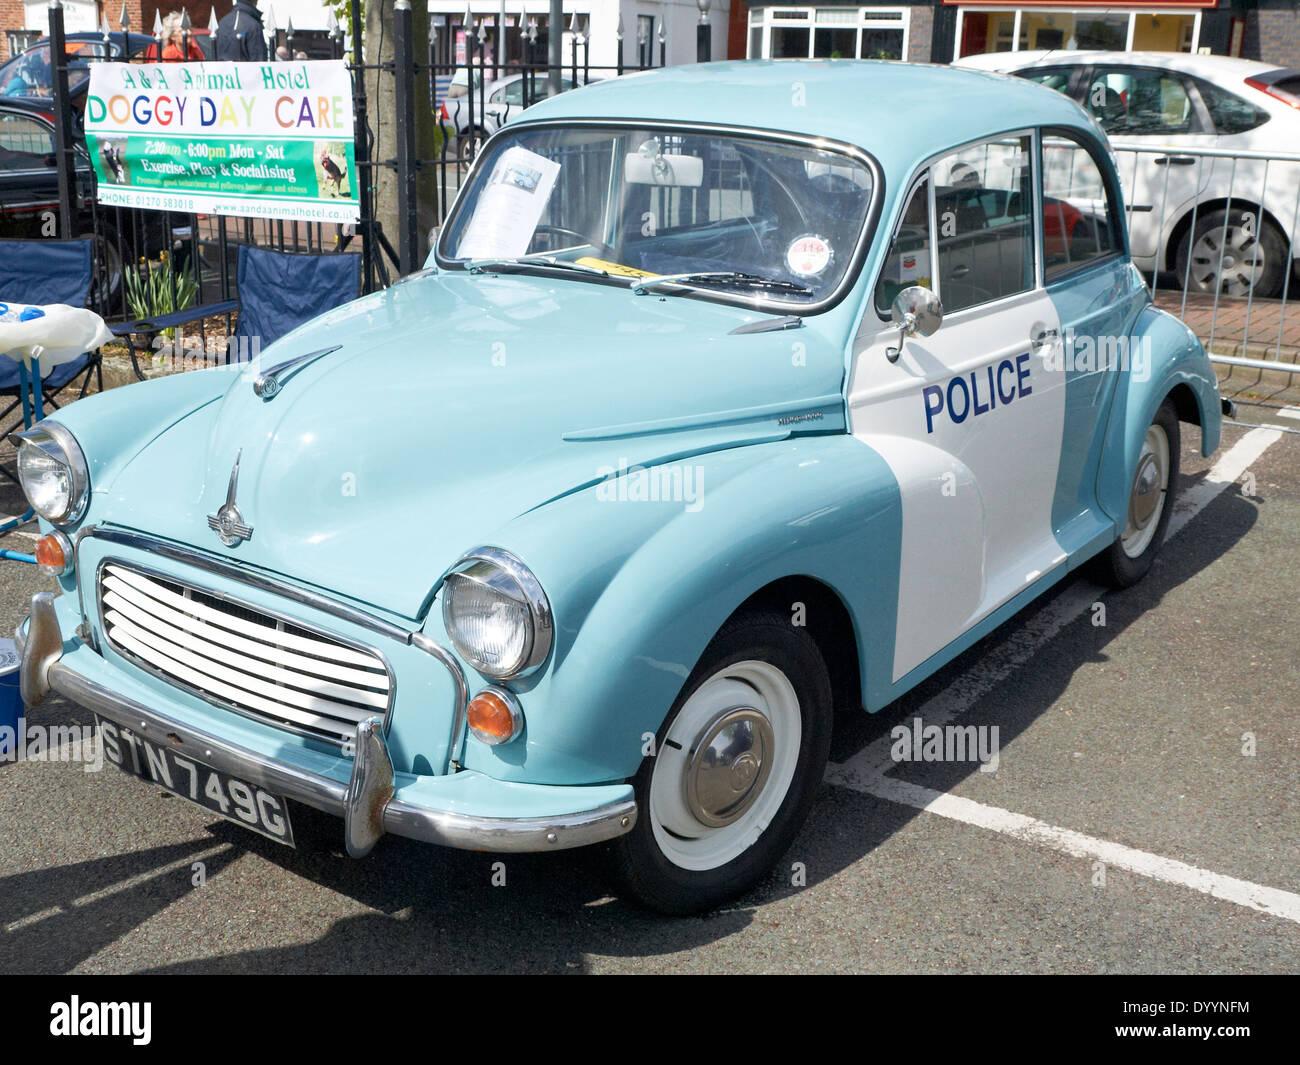 Morris Minor police car on display in Sandbach Cheshire UK Stock Photo